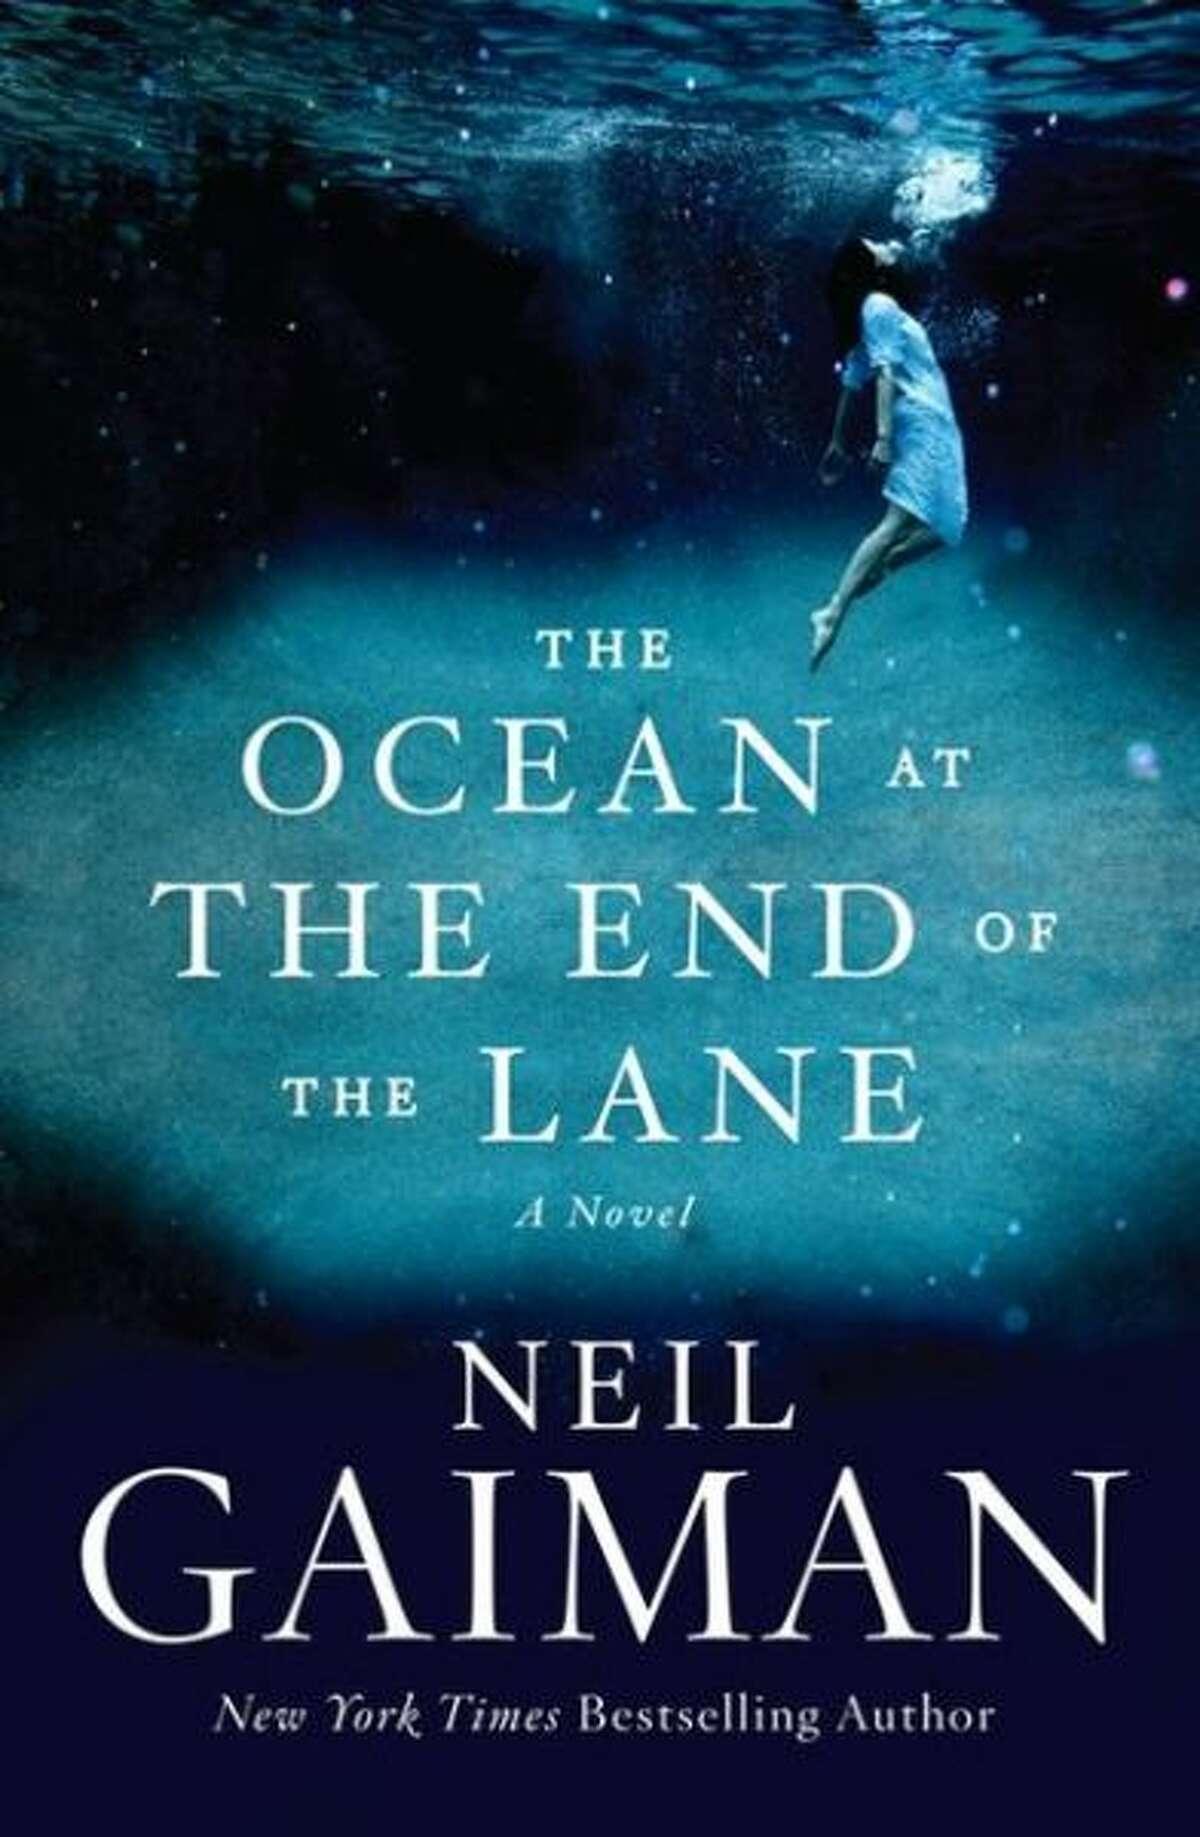 Neil Gaiman's